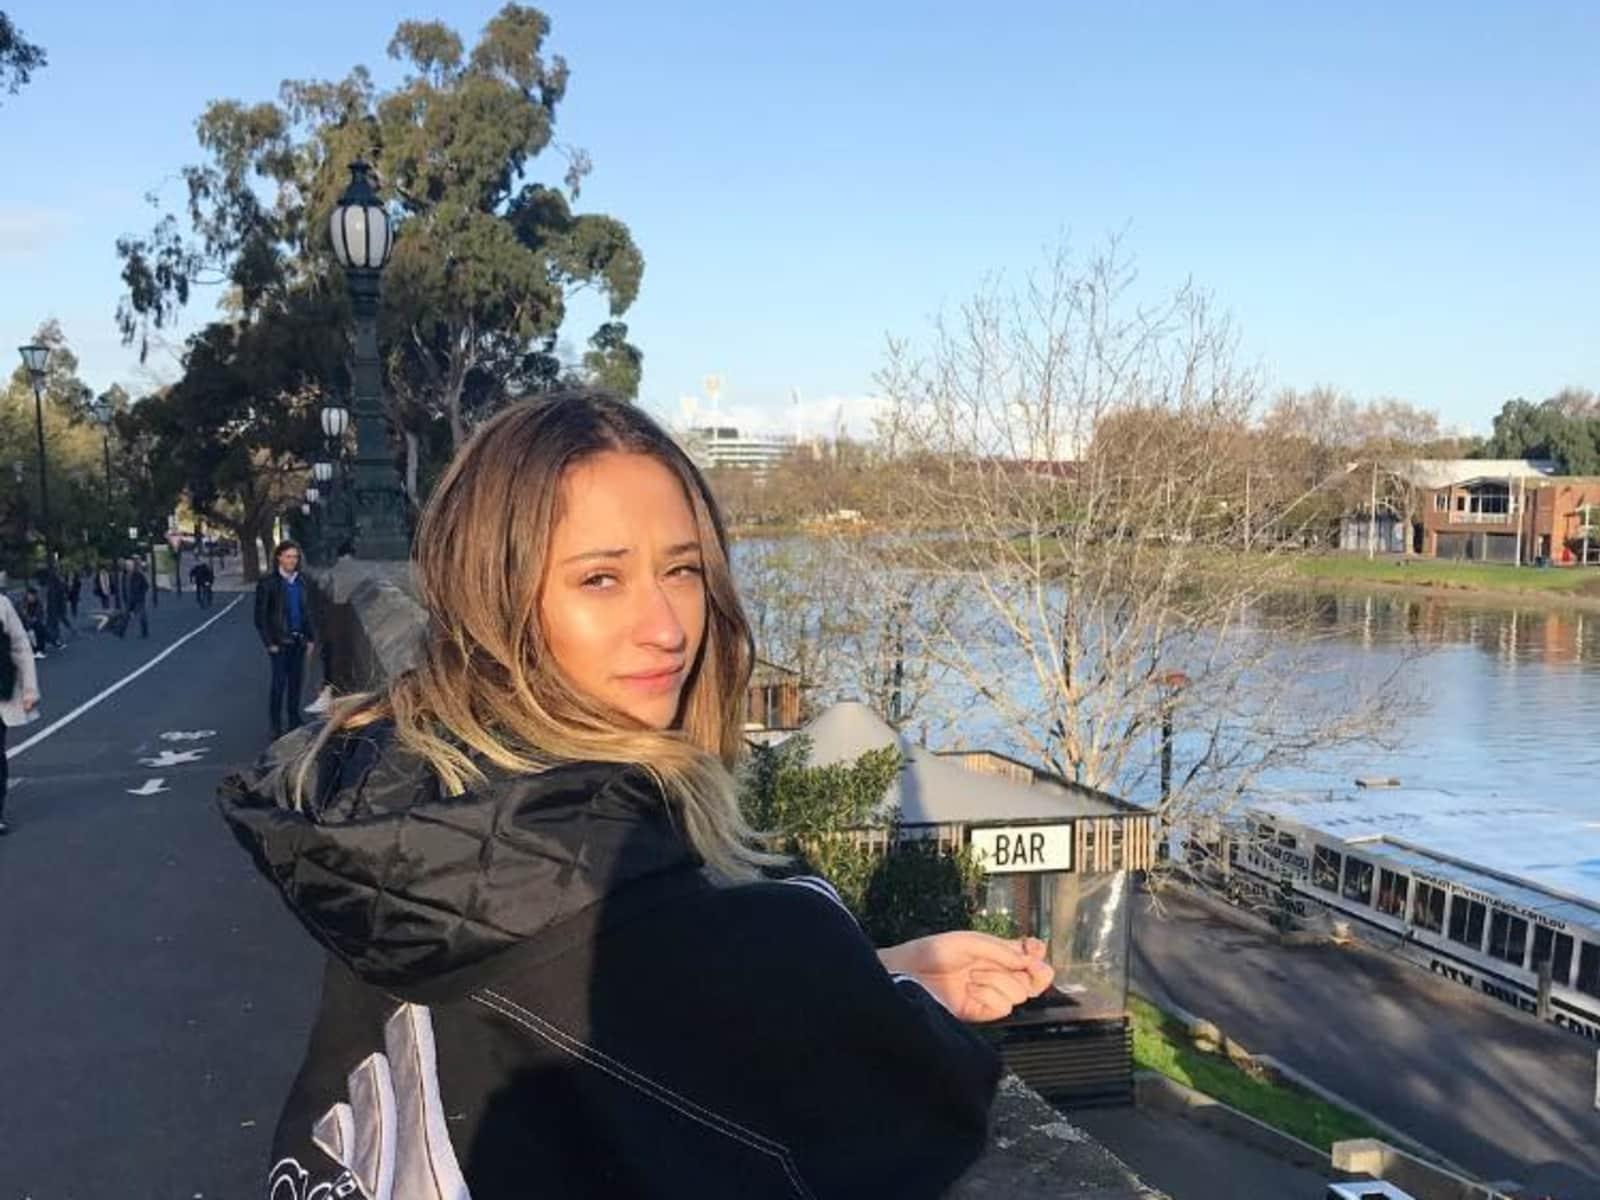 Tammie from Melbourne, Victoria, Australia